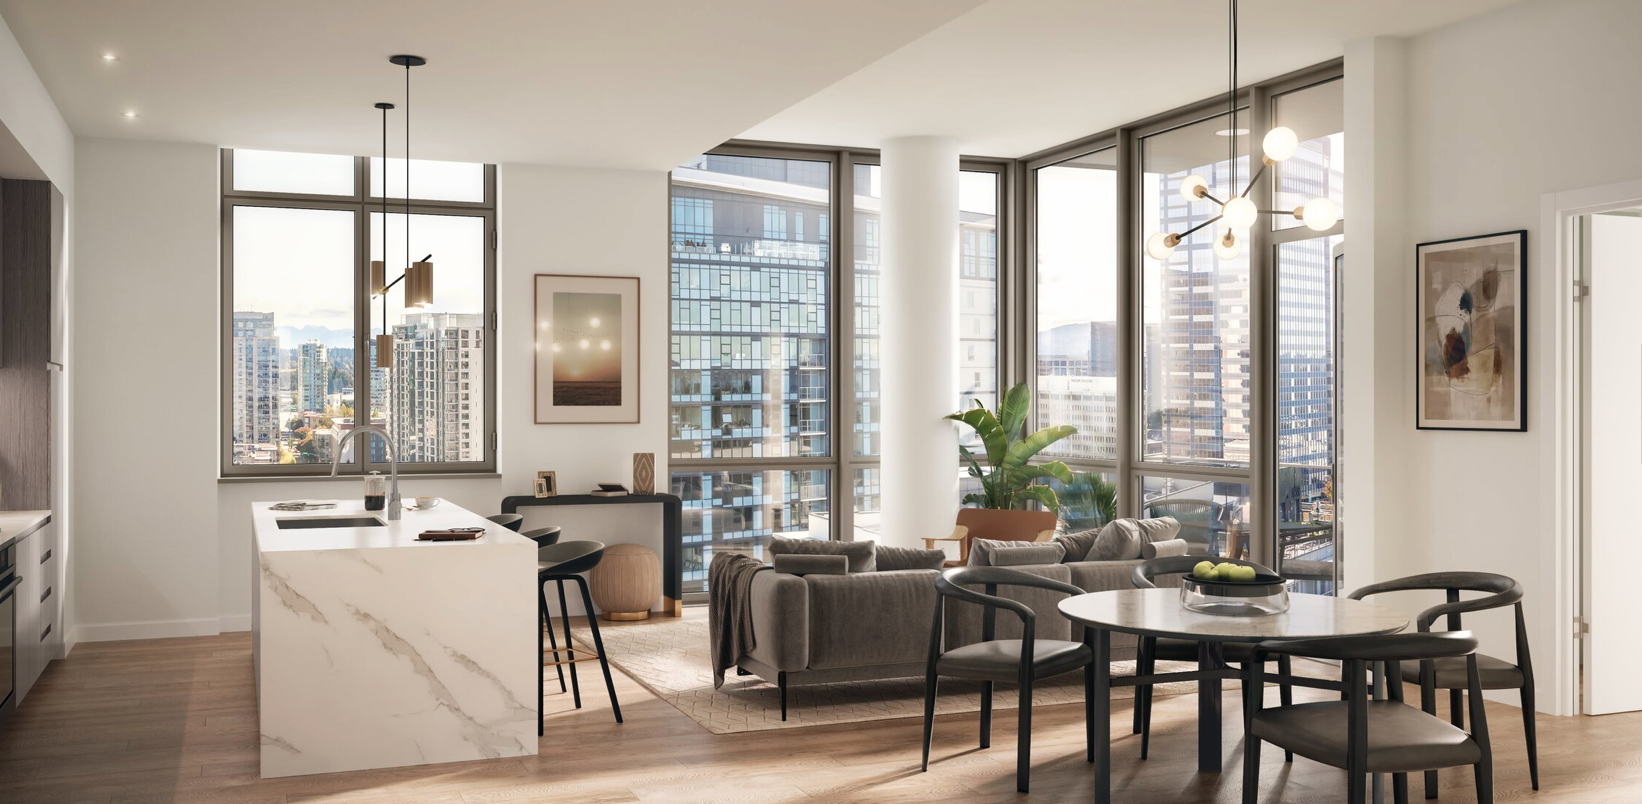 MARI, High-rise luxury condo building on NE 10th Street in Bellevue